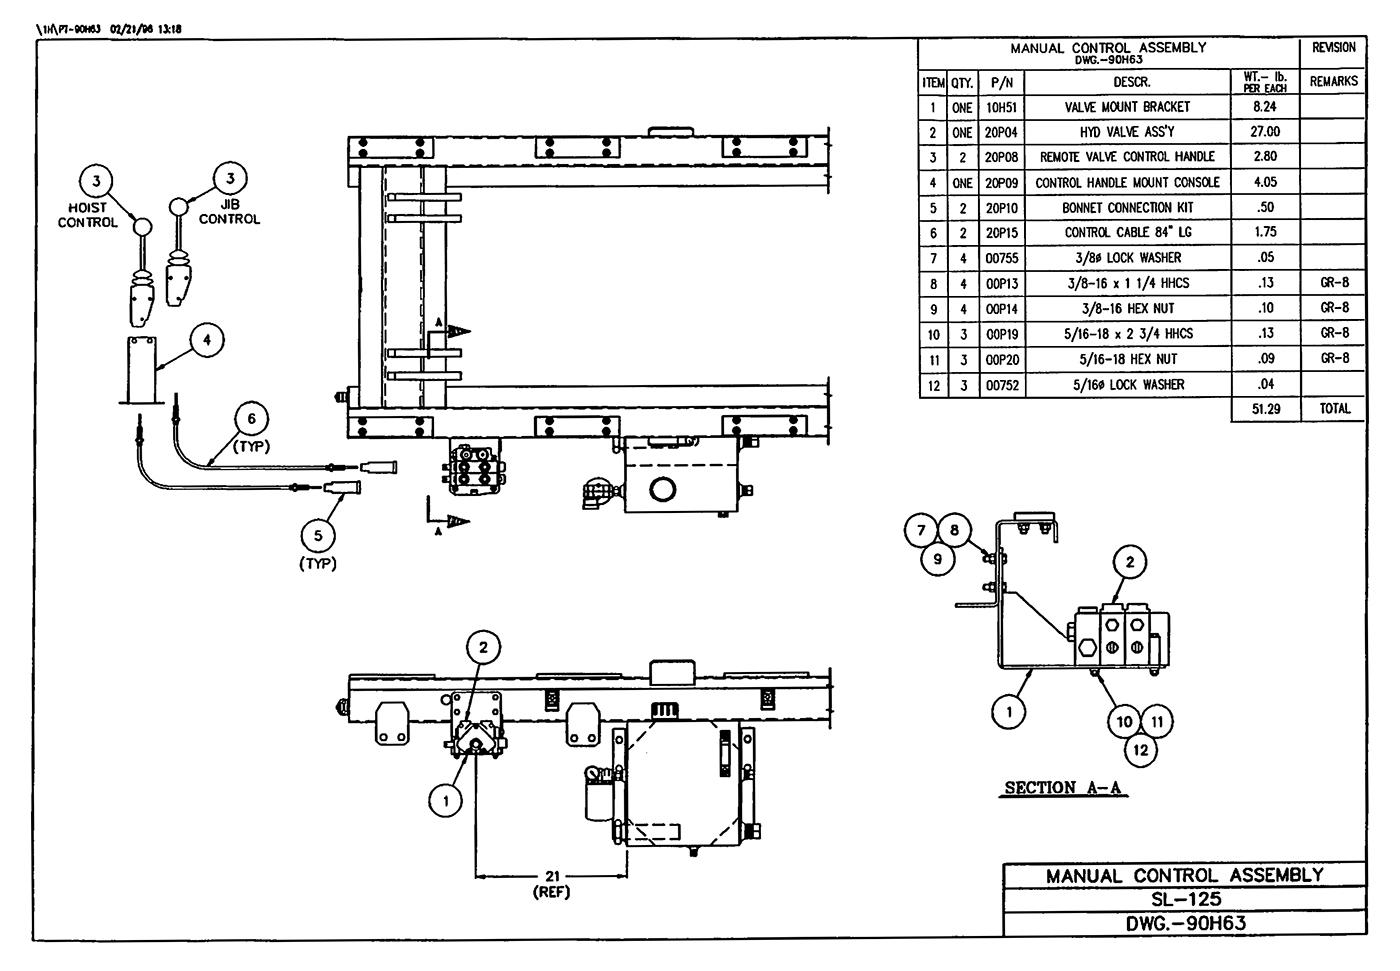 hight resolution of honda sl125 wiring diagram wiring diagram blog honda cb125 wiring diagram honda sl125 wiring diagram